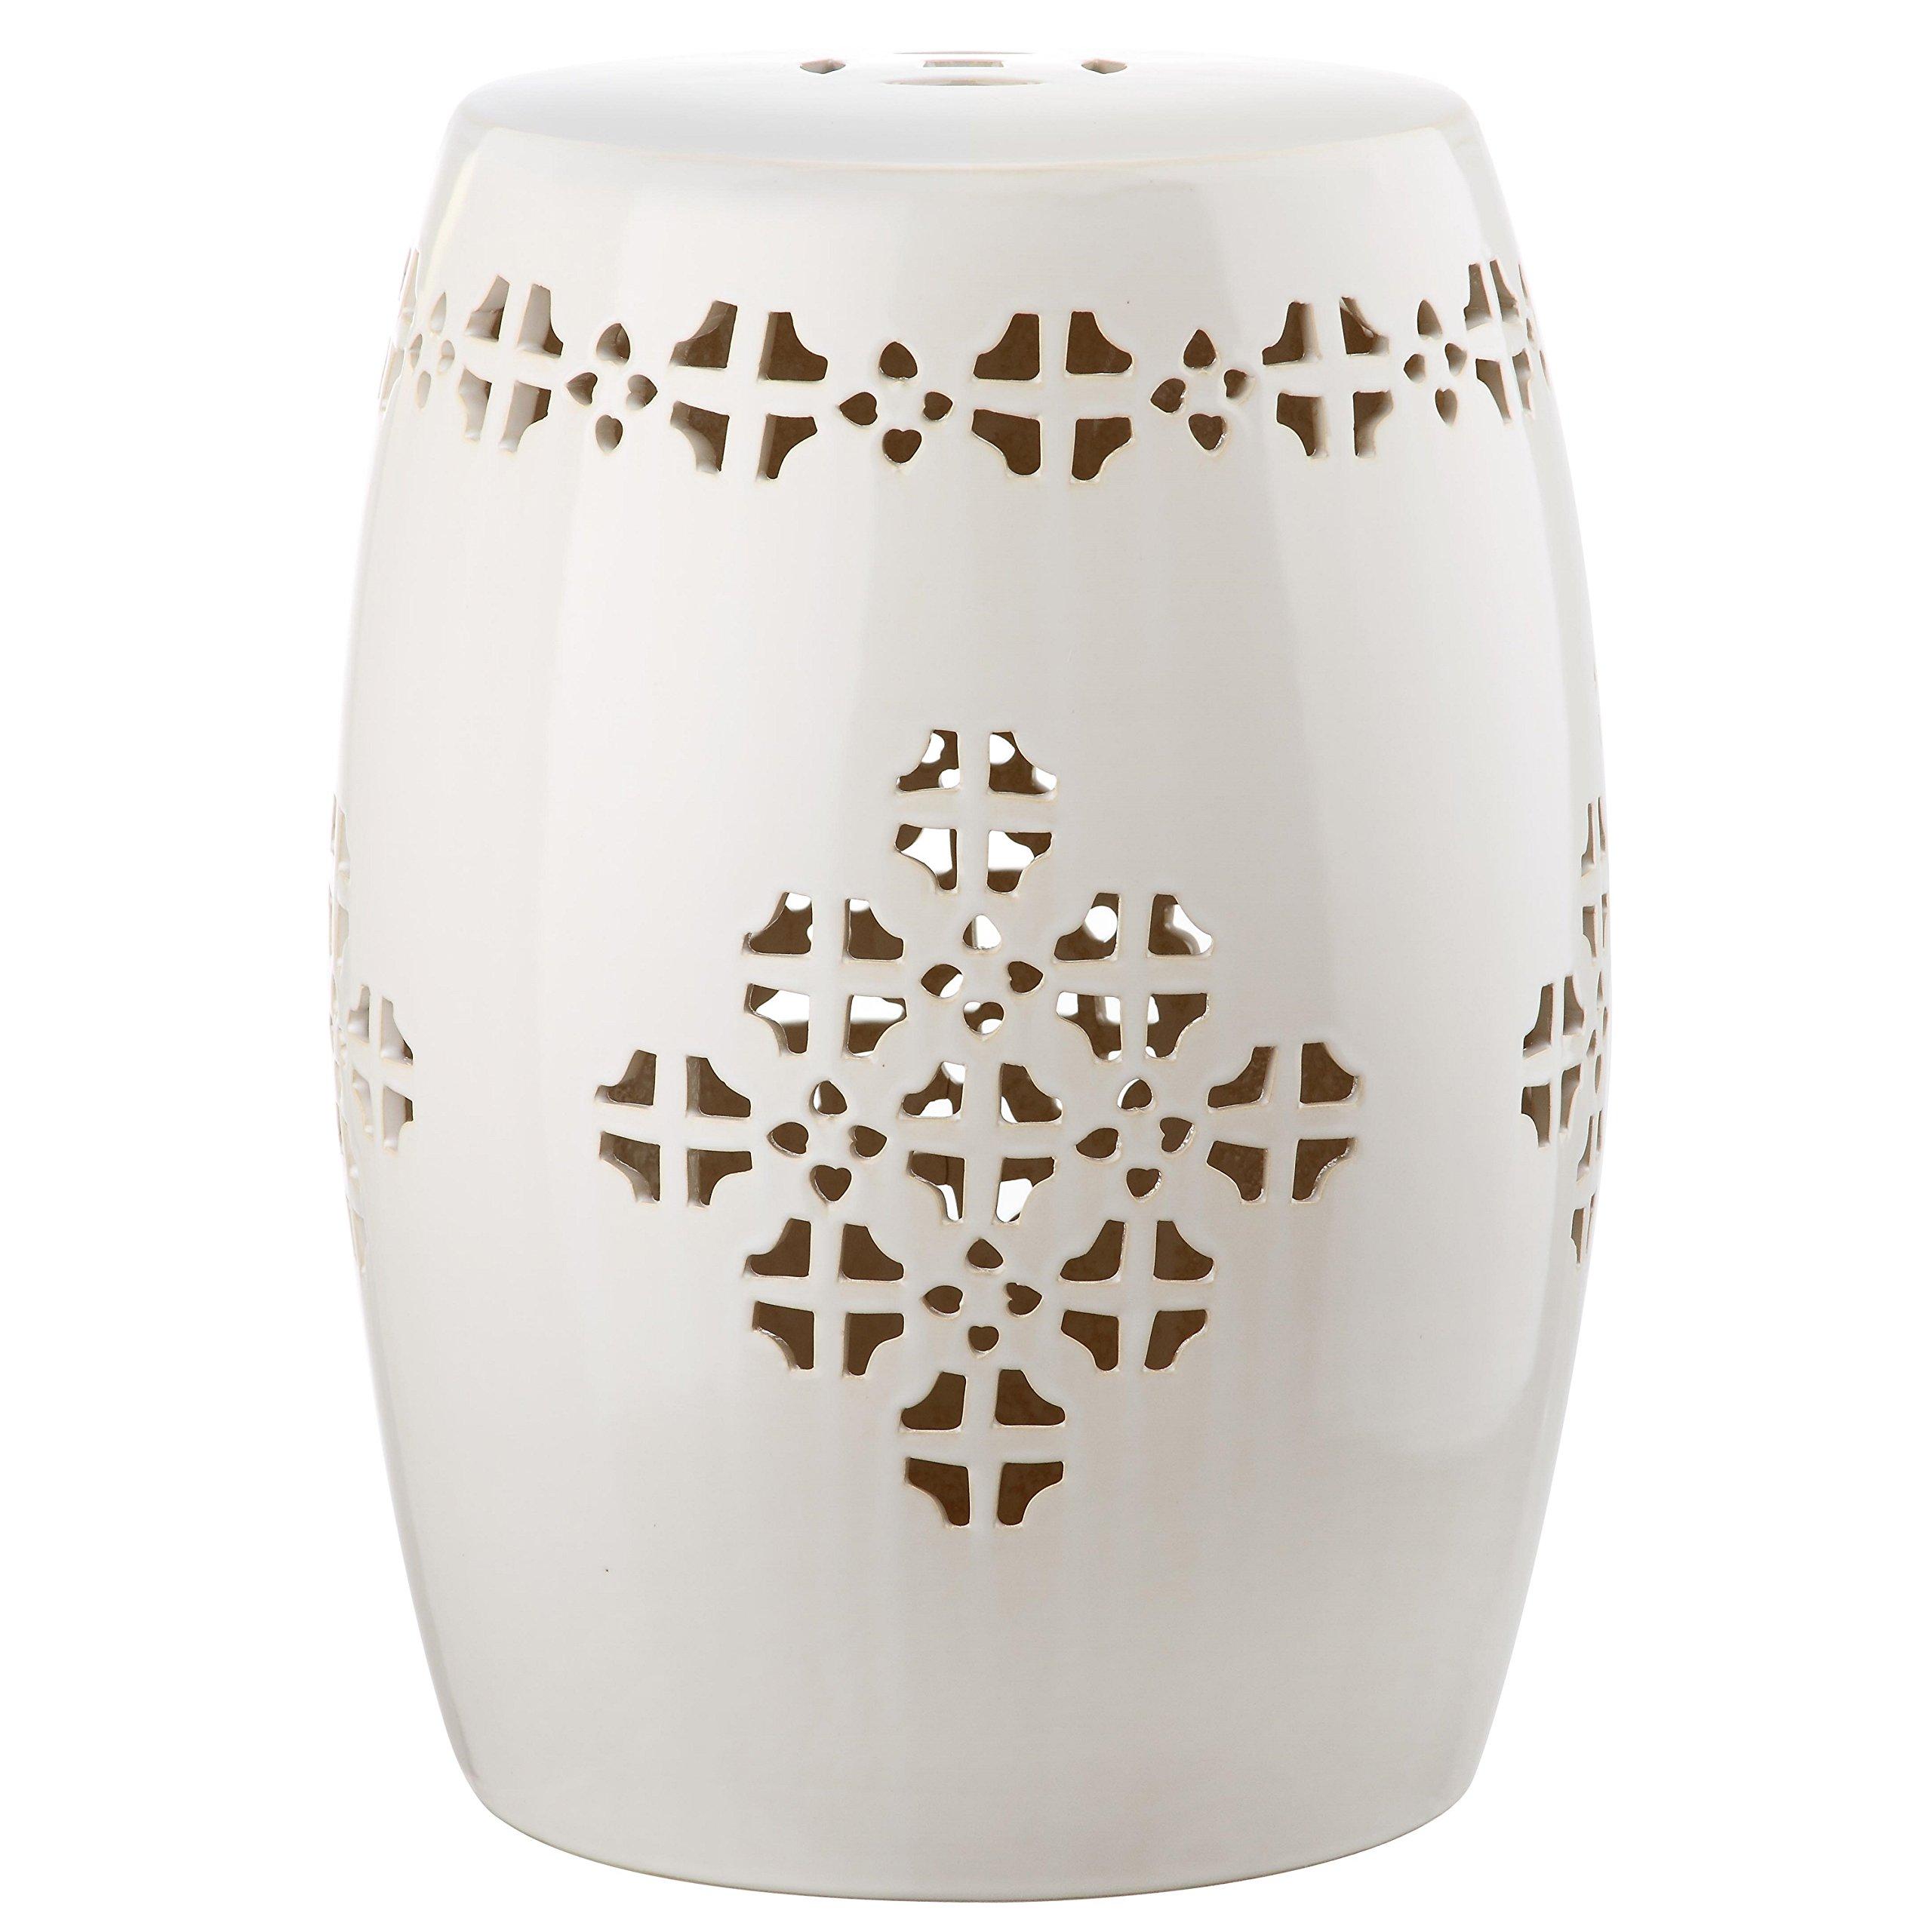 Safavieh Castle Gardens Collection Quatrefoil Cream Glazed Ceramic Garden Stool